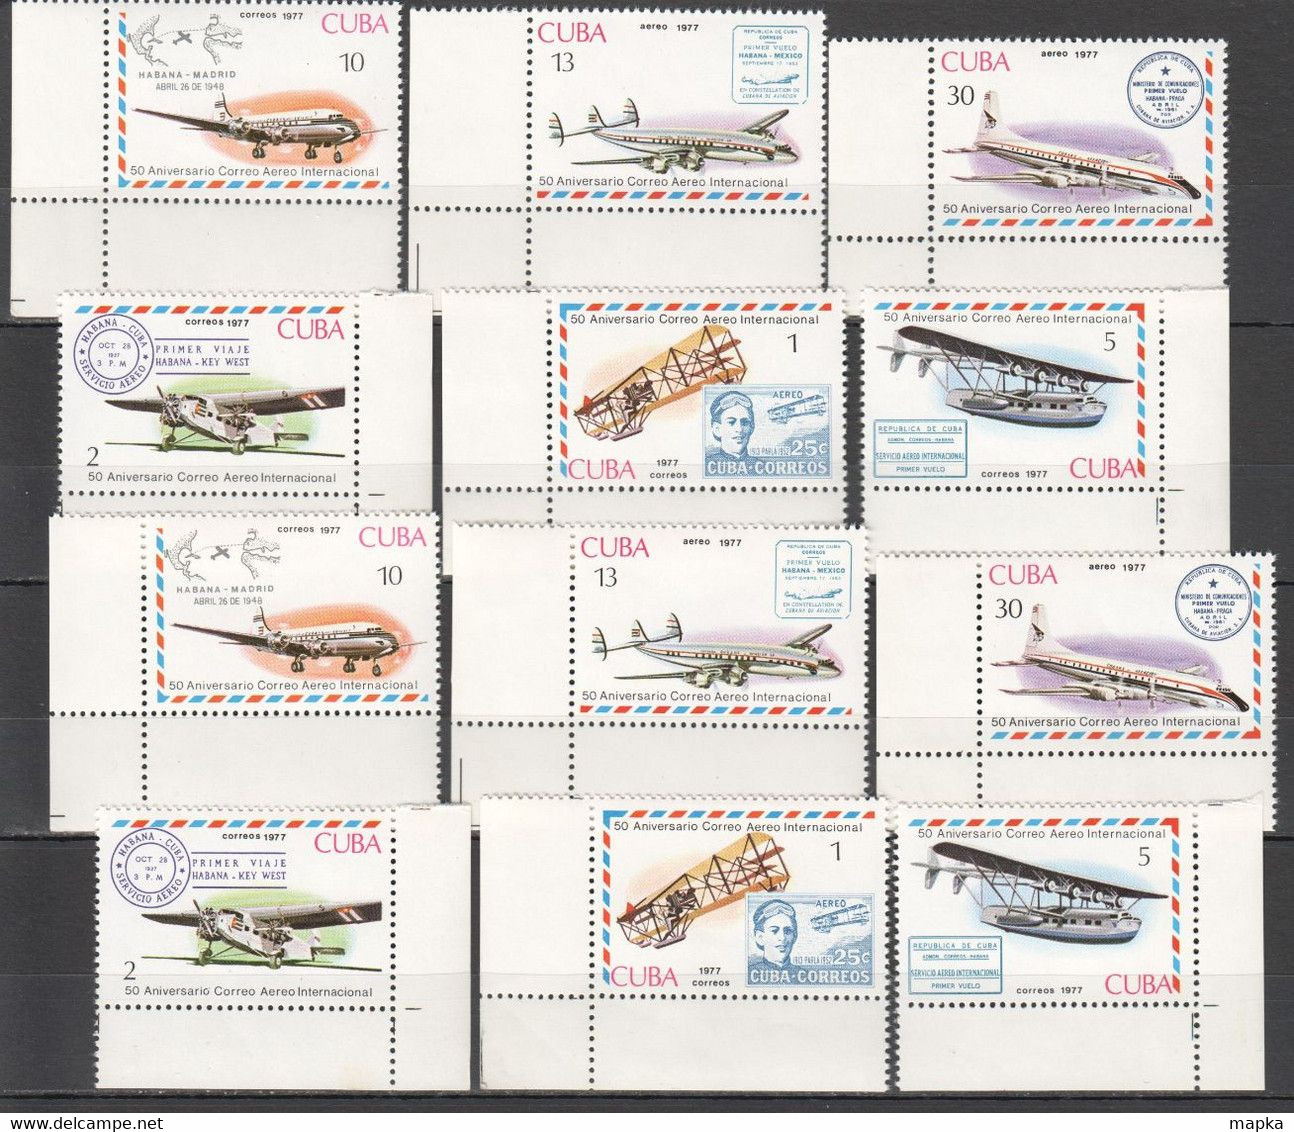 UU879 1977 CUBA TRANSPORT AVIATION AEREO INTERNACIONAL 2SET MNH - Airplanes